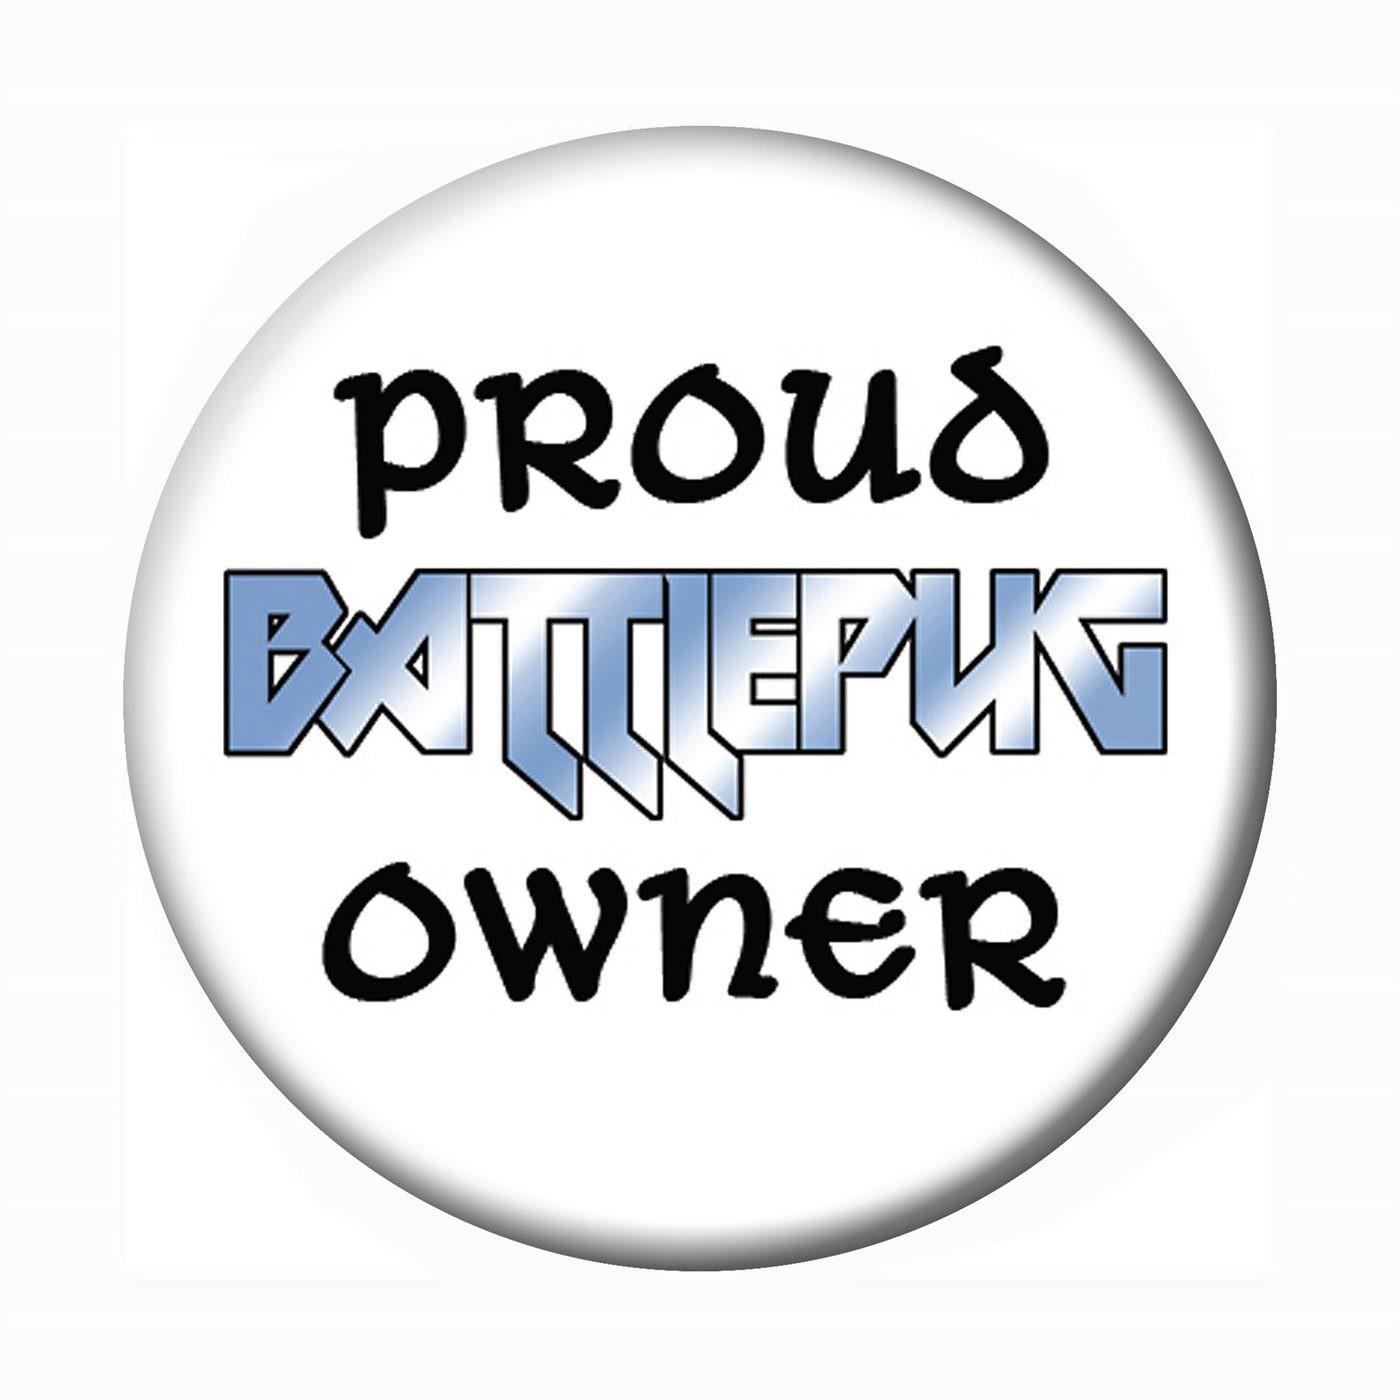 BattlePug Proud Owner Button